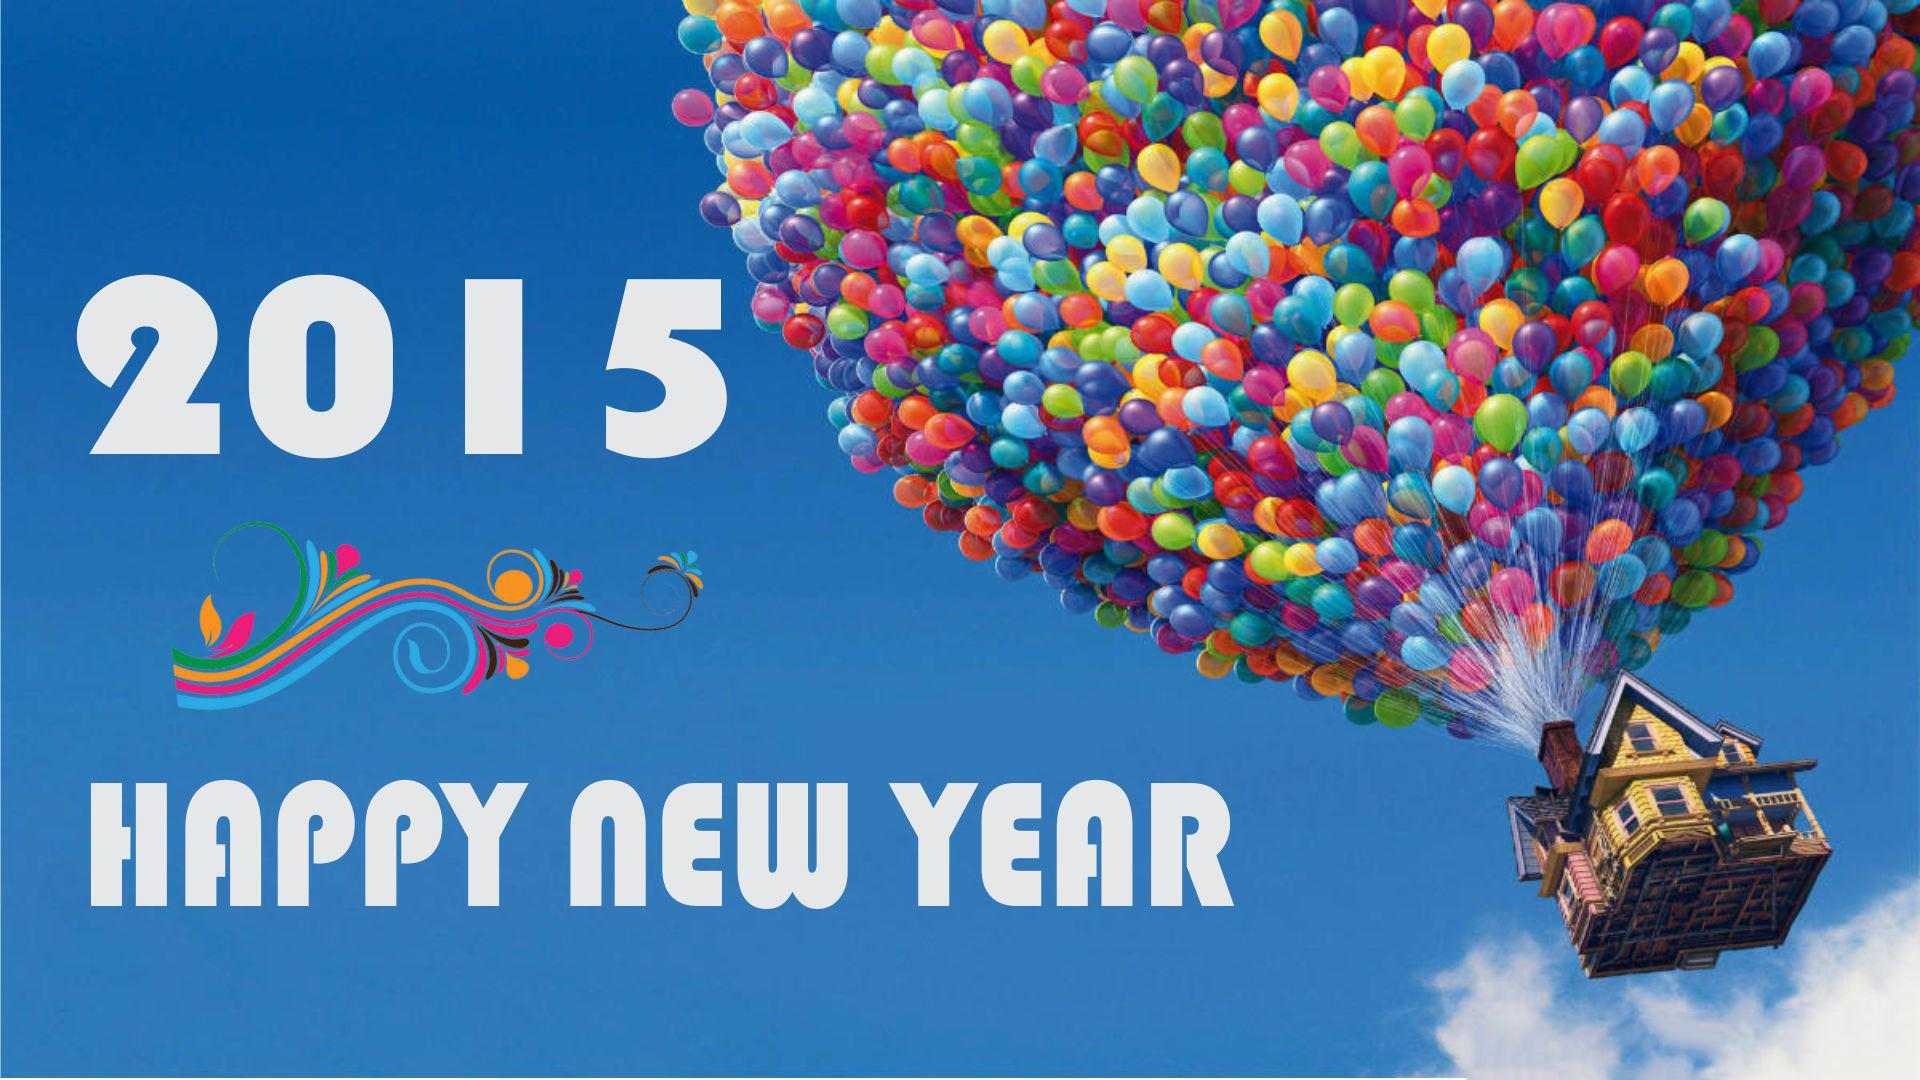 hd new year celebration 2015 wallpaper widescr 15371 wallpaper 1920x1080